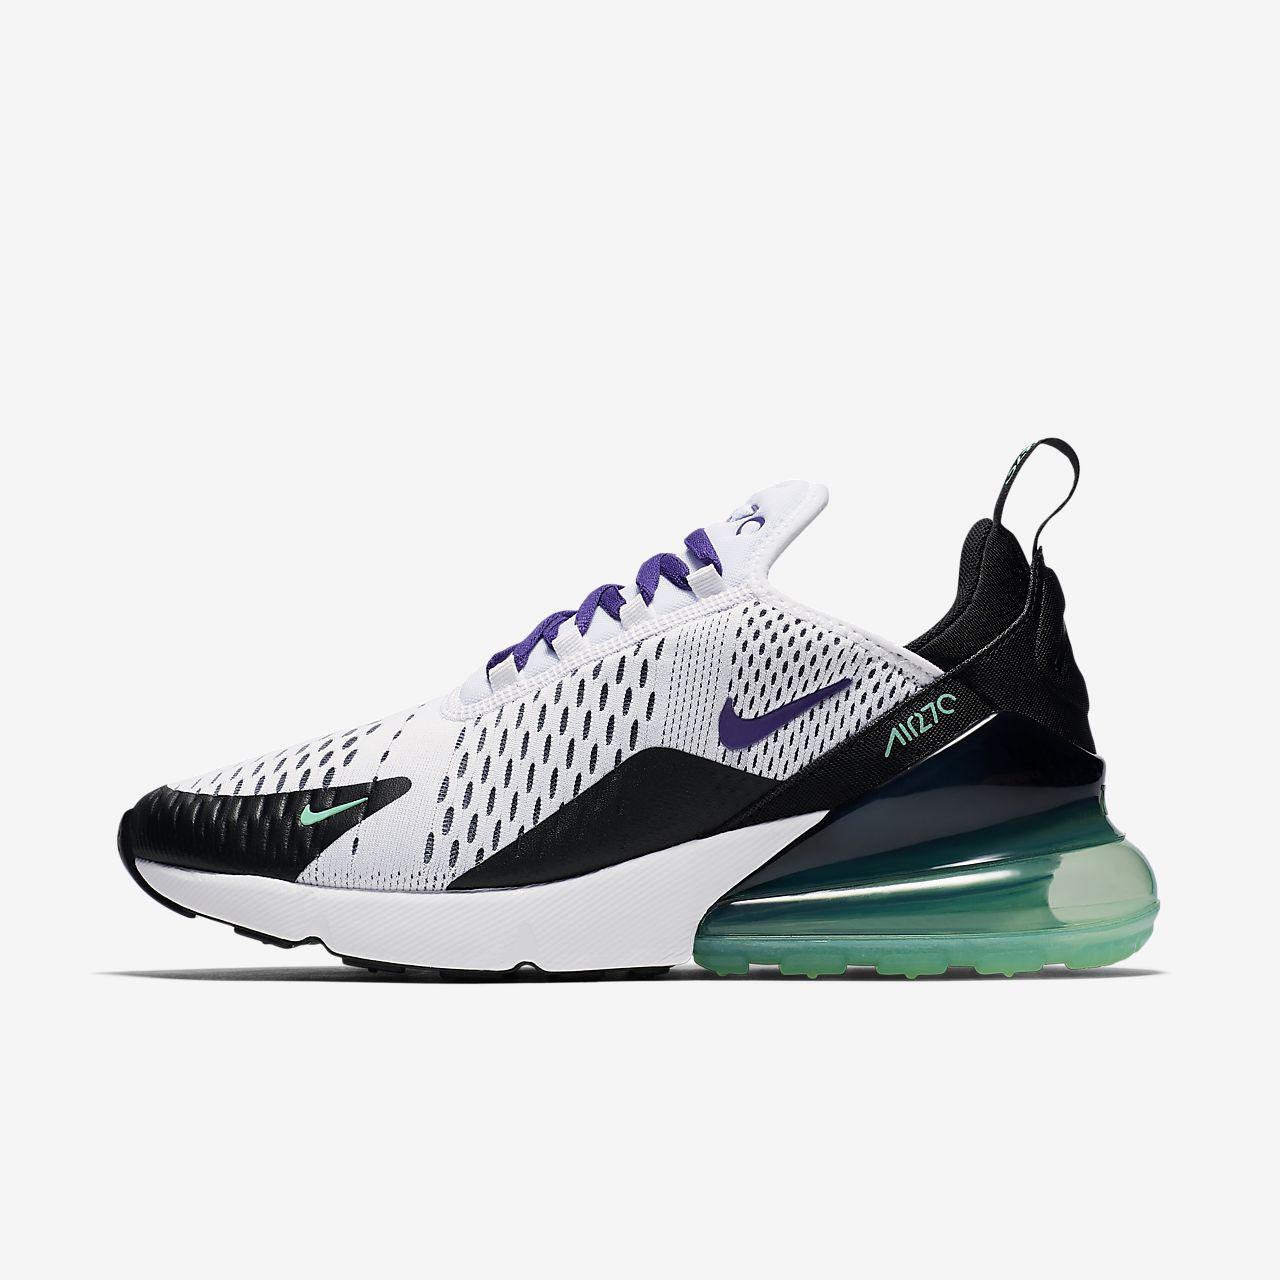 nike schuhe,Nike Air Max 270 AH6789 103 Women White Black